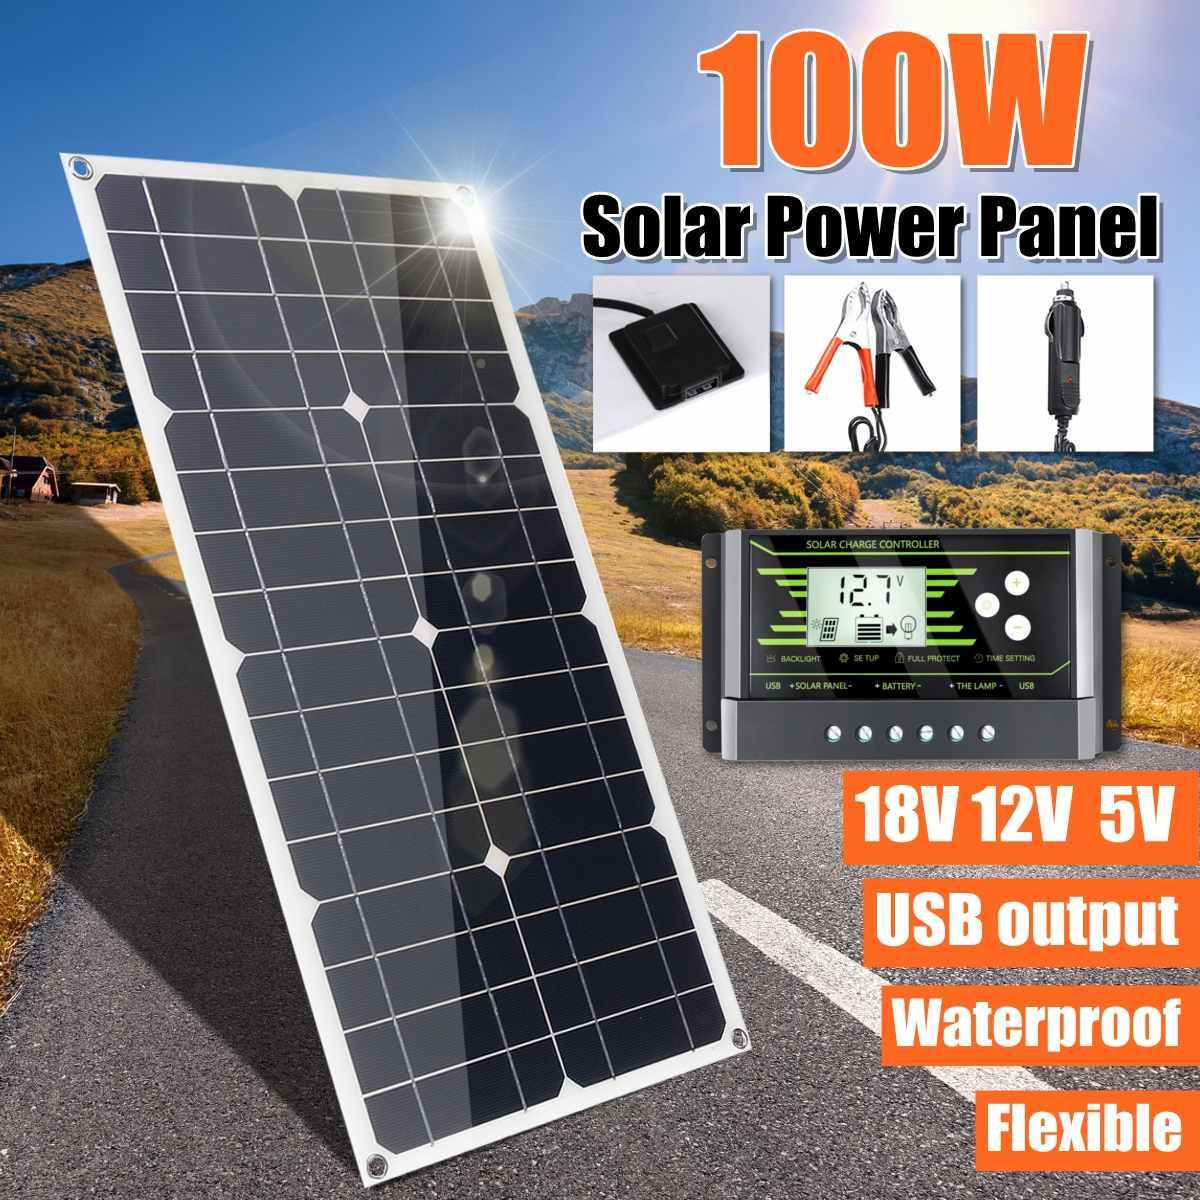 100W 18V Mono Solar Panel USB 12V/5V DC Monocrystalline Flexible Solar Charger For Car RV Boat Battery Charger Waterproof